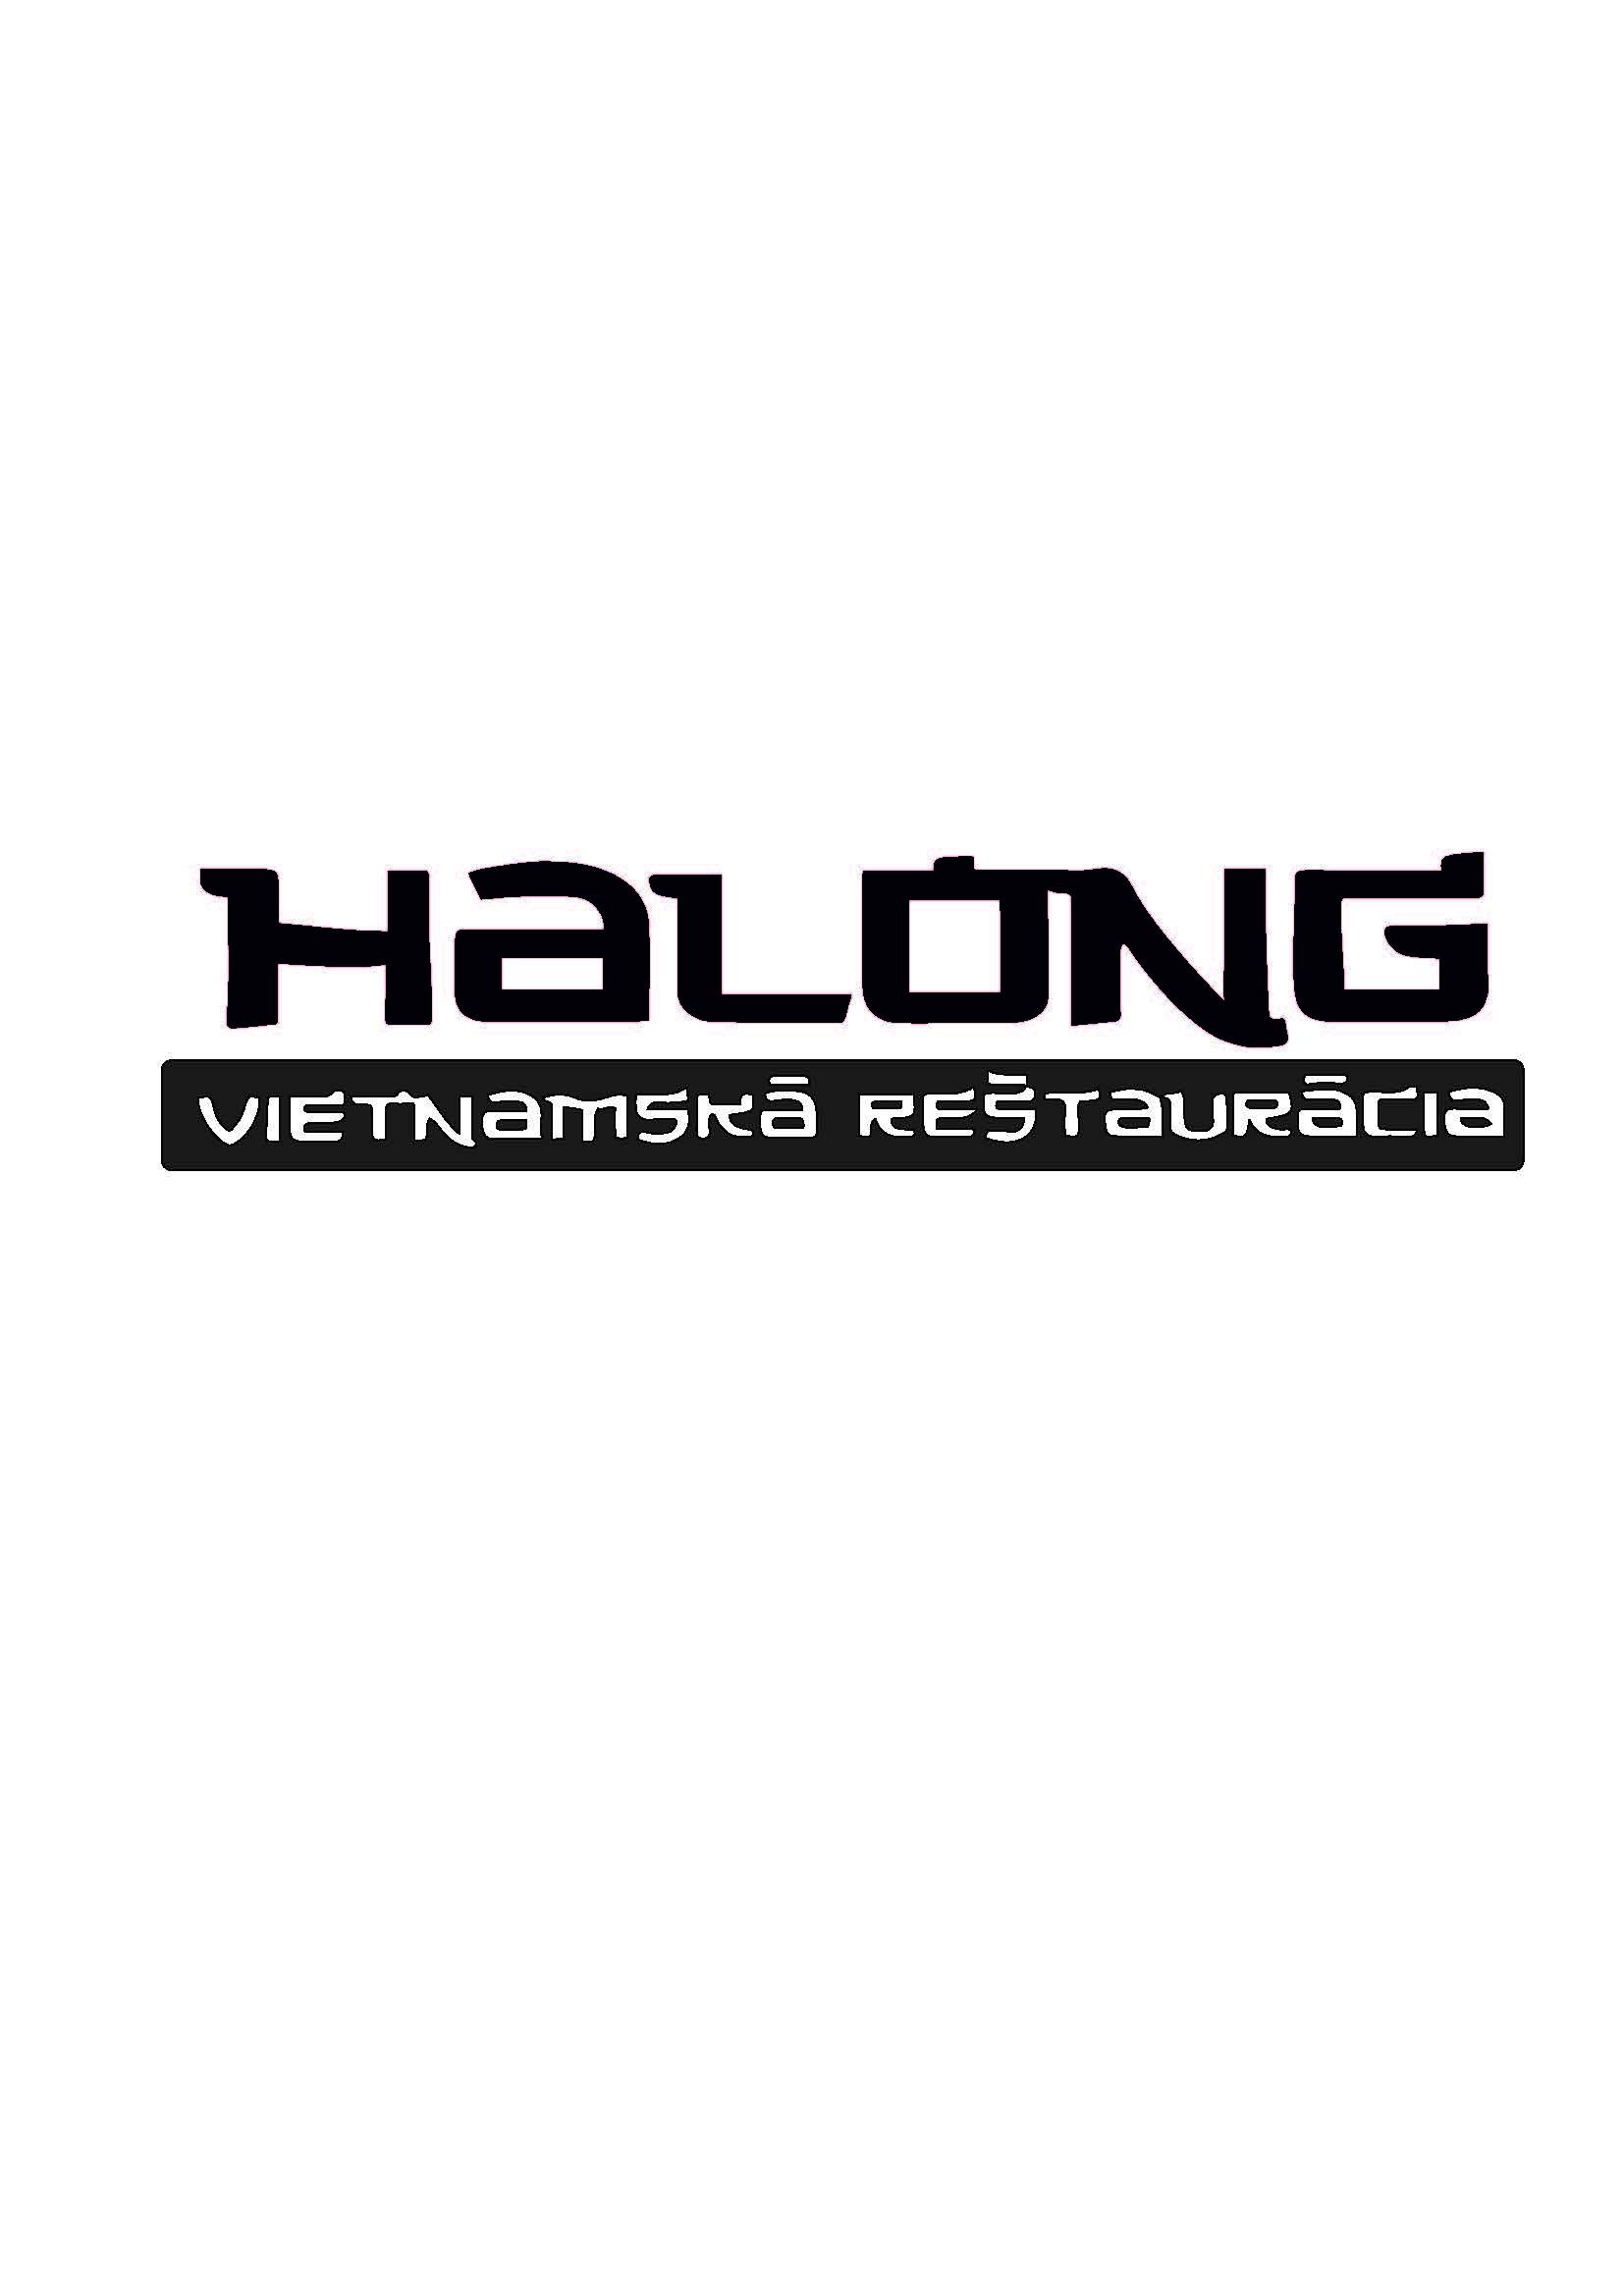 HALONG